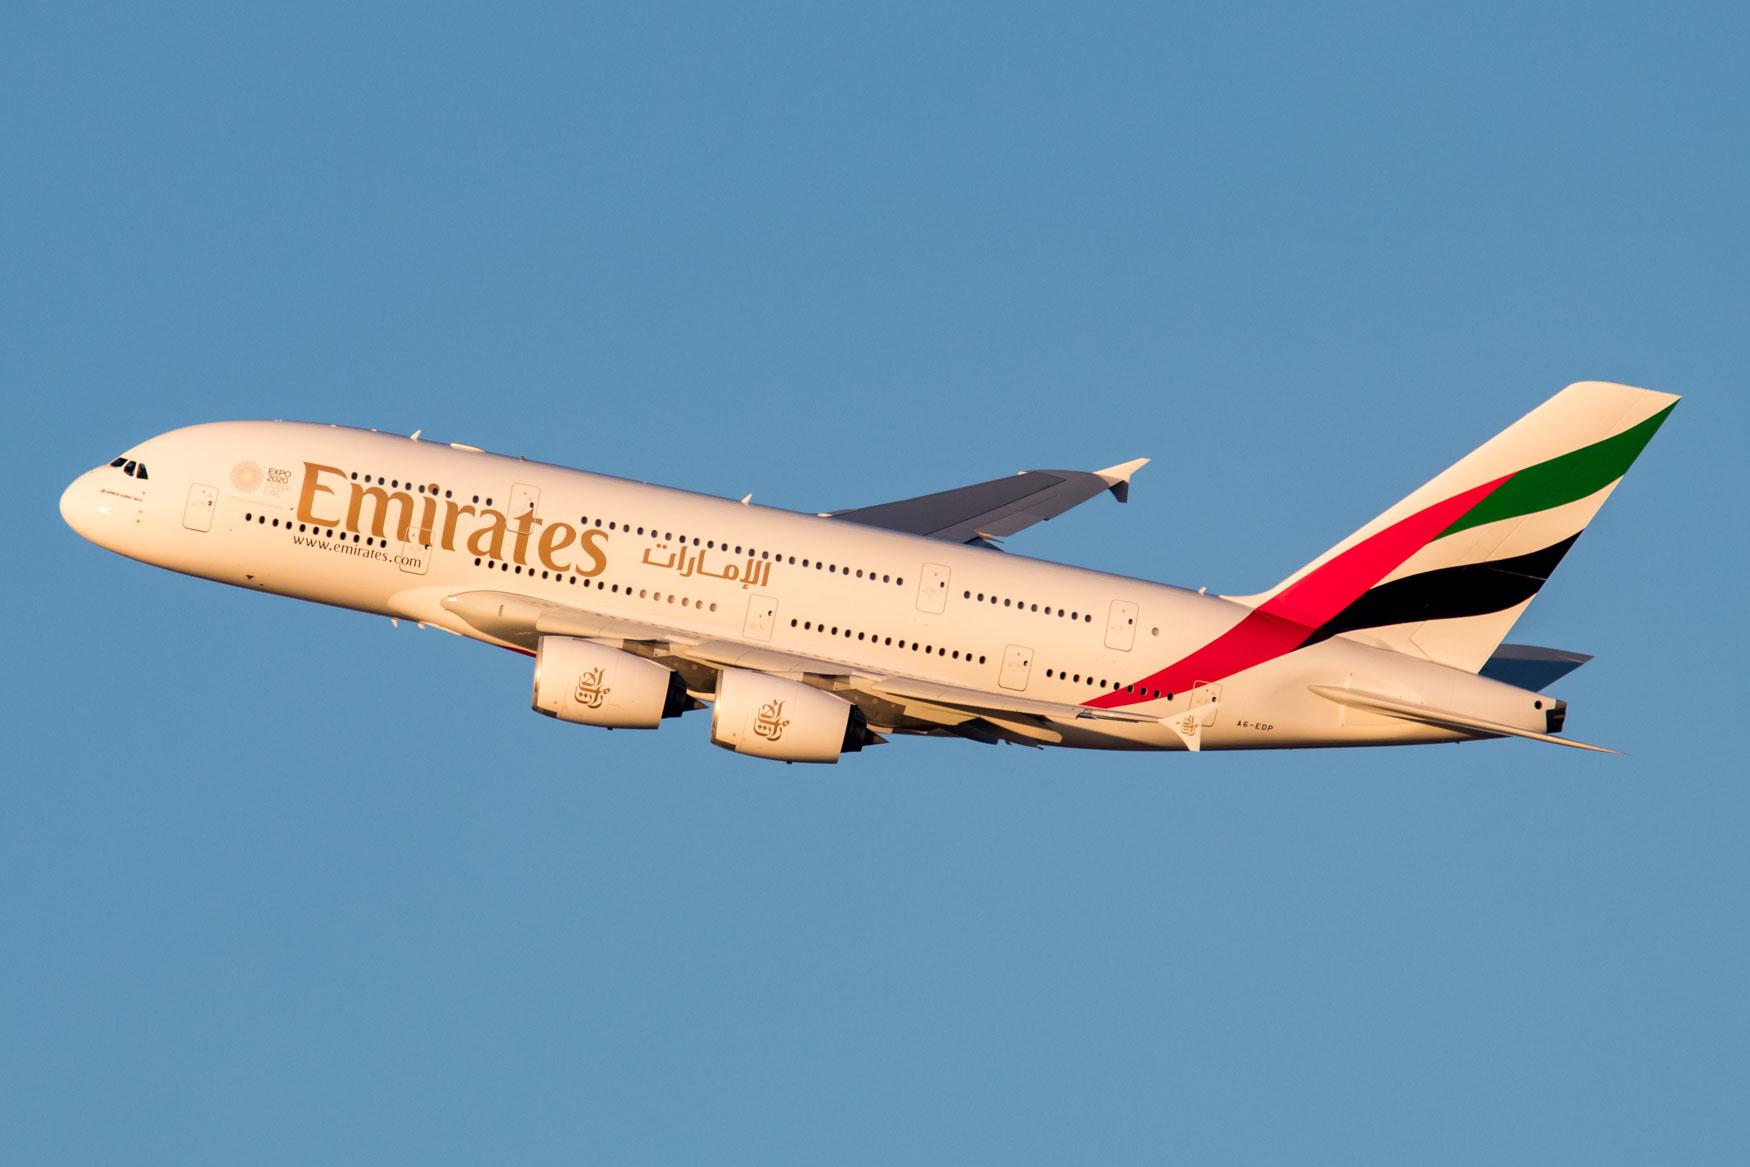 Emirates A380 Departing New York JFK Airport